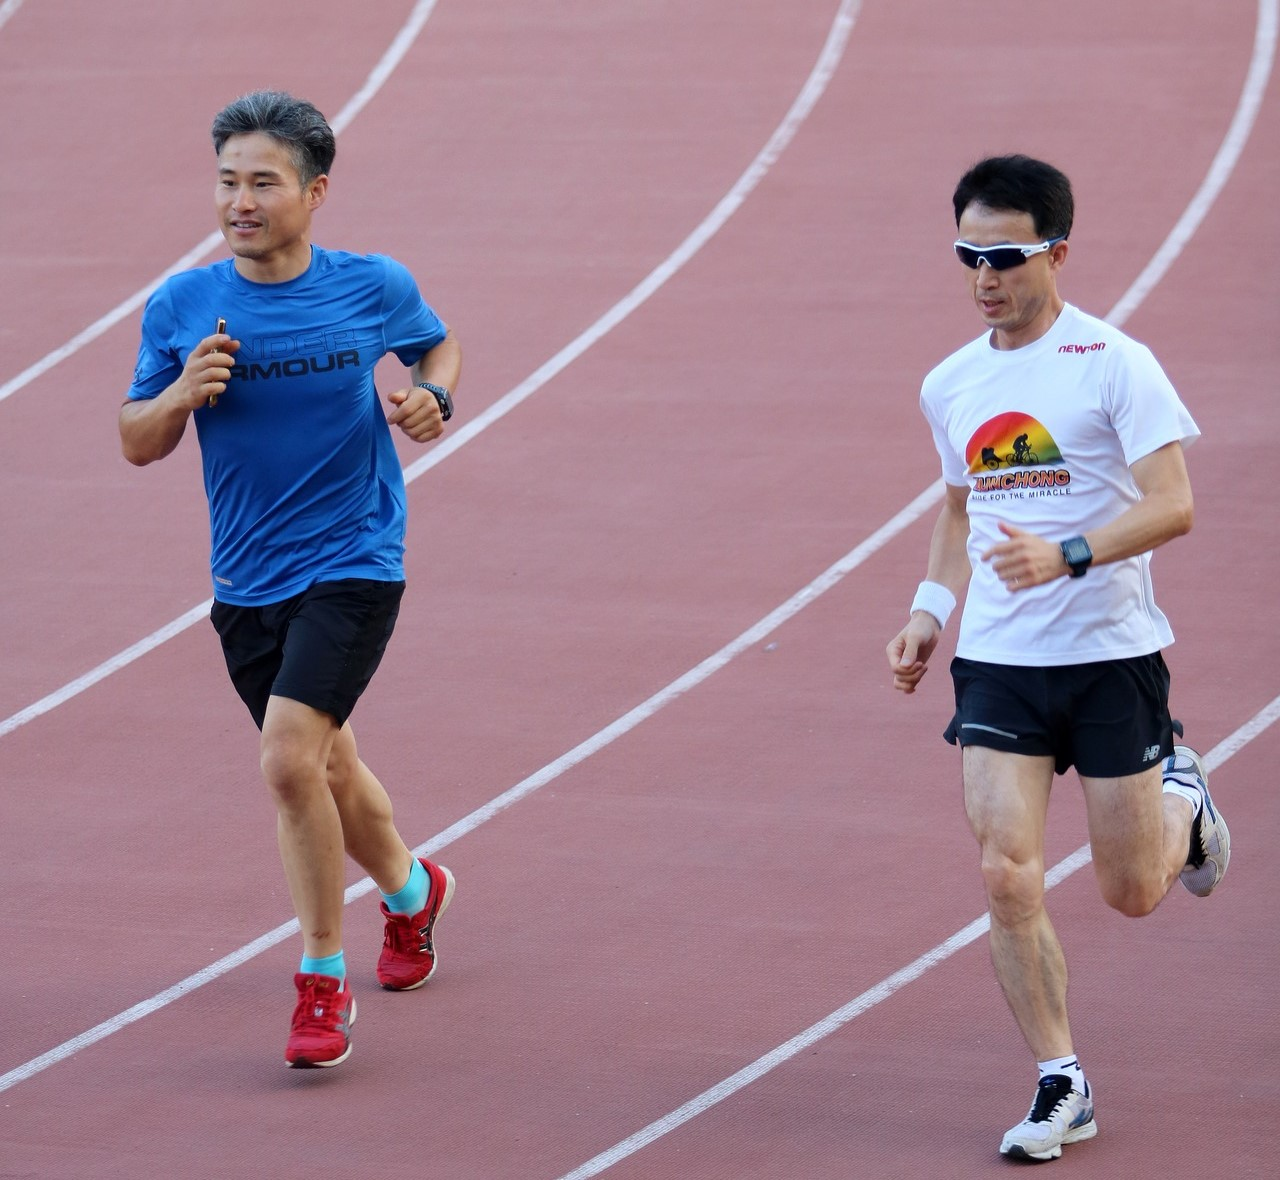 2 boys running on a race track